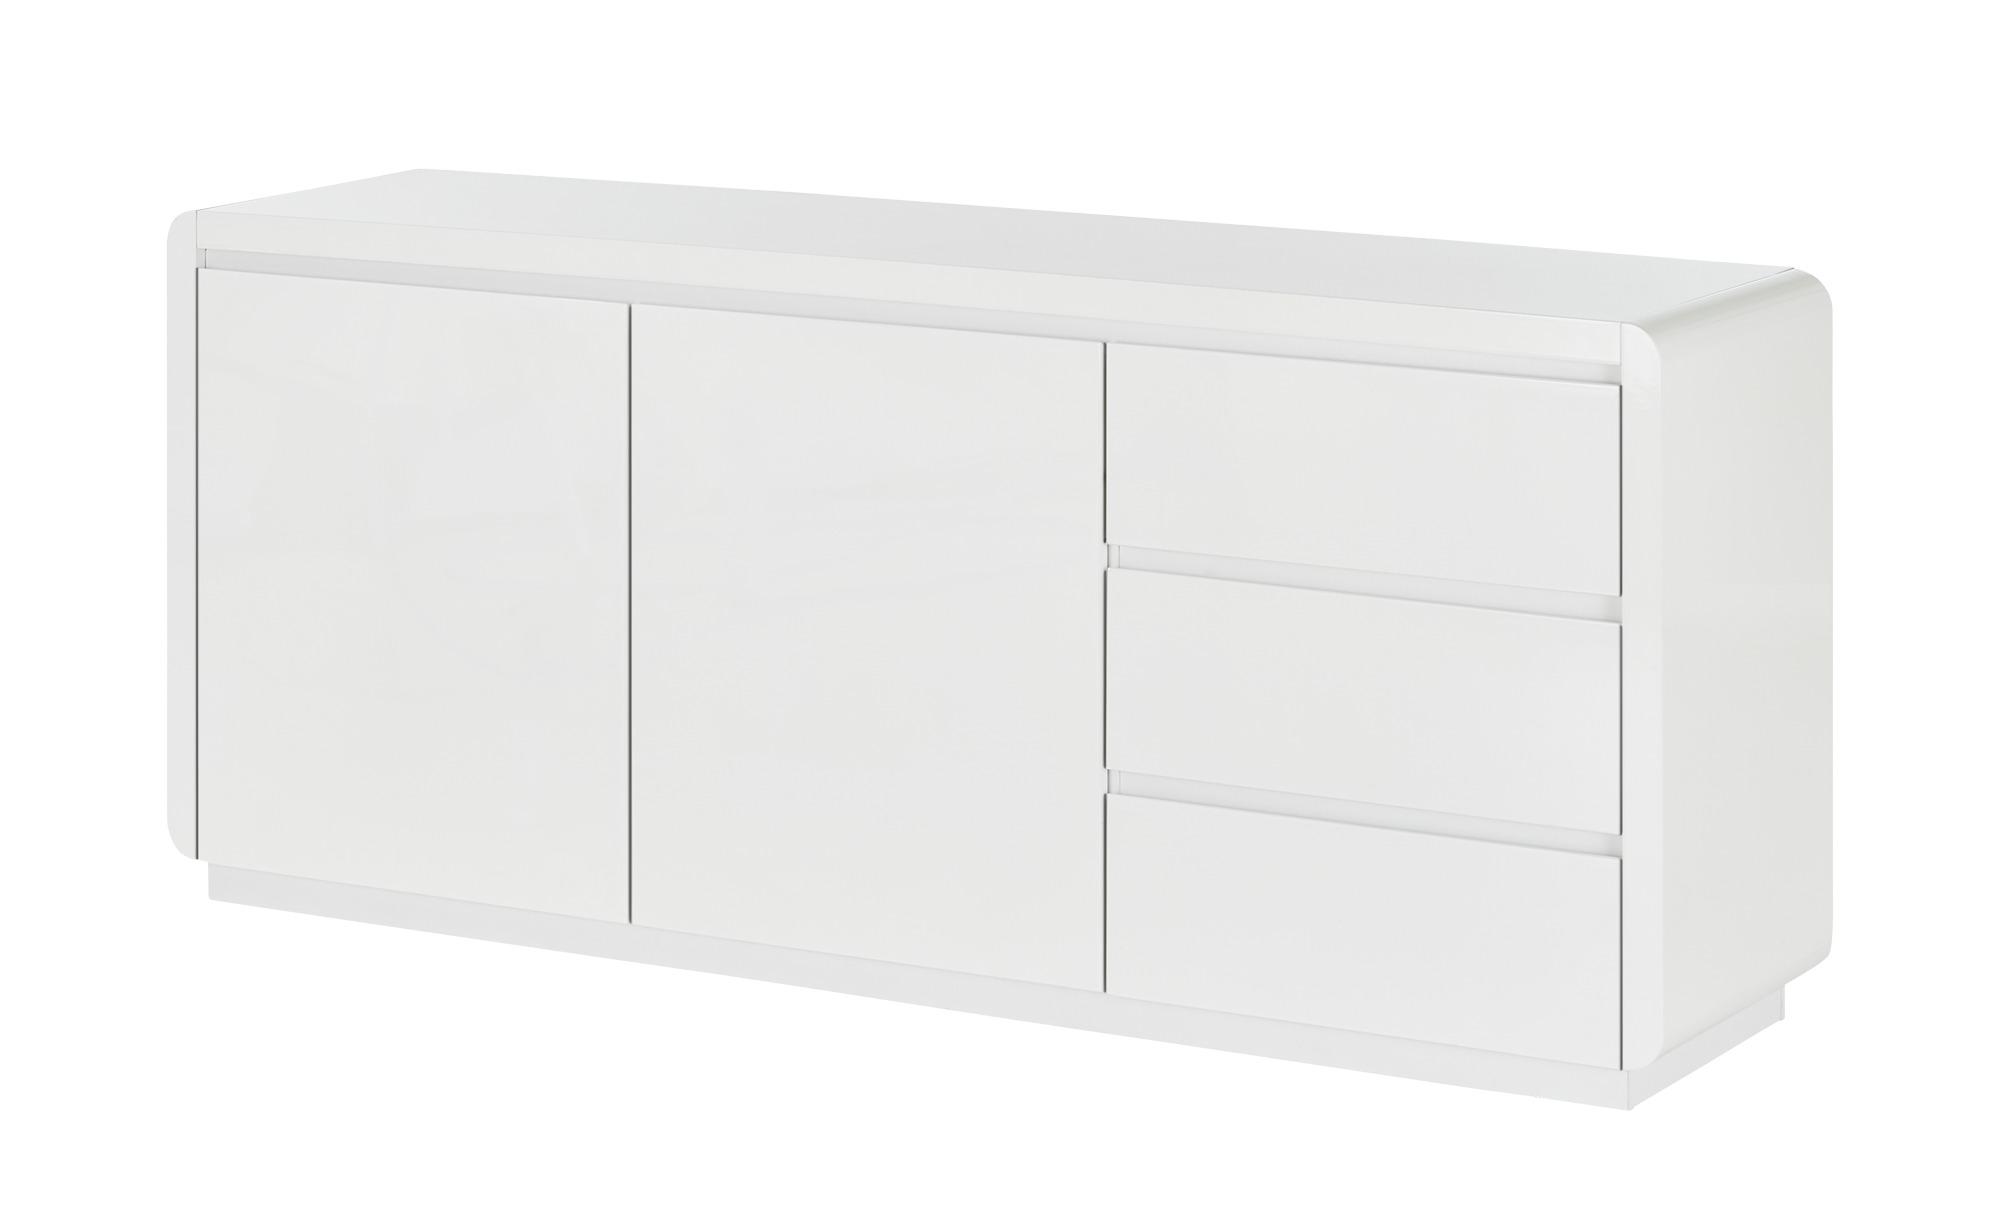 Sideboard  Polar ¦ weiß ¦ Maße (cm): B: 180 H: 78,5 T: 45 Kommoden & Sideboards > Sideboards - Höffner